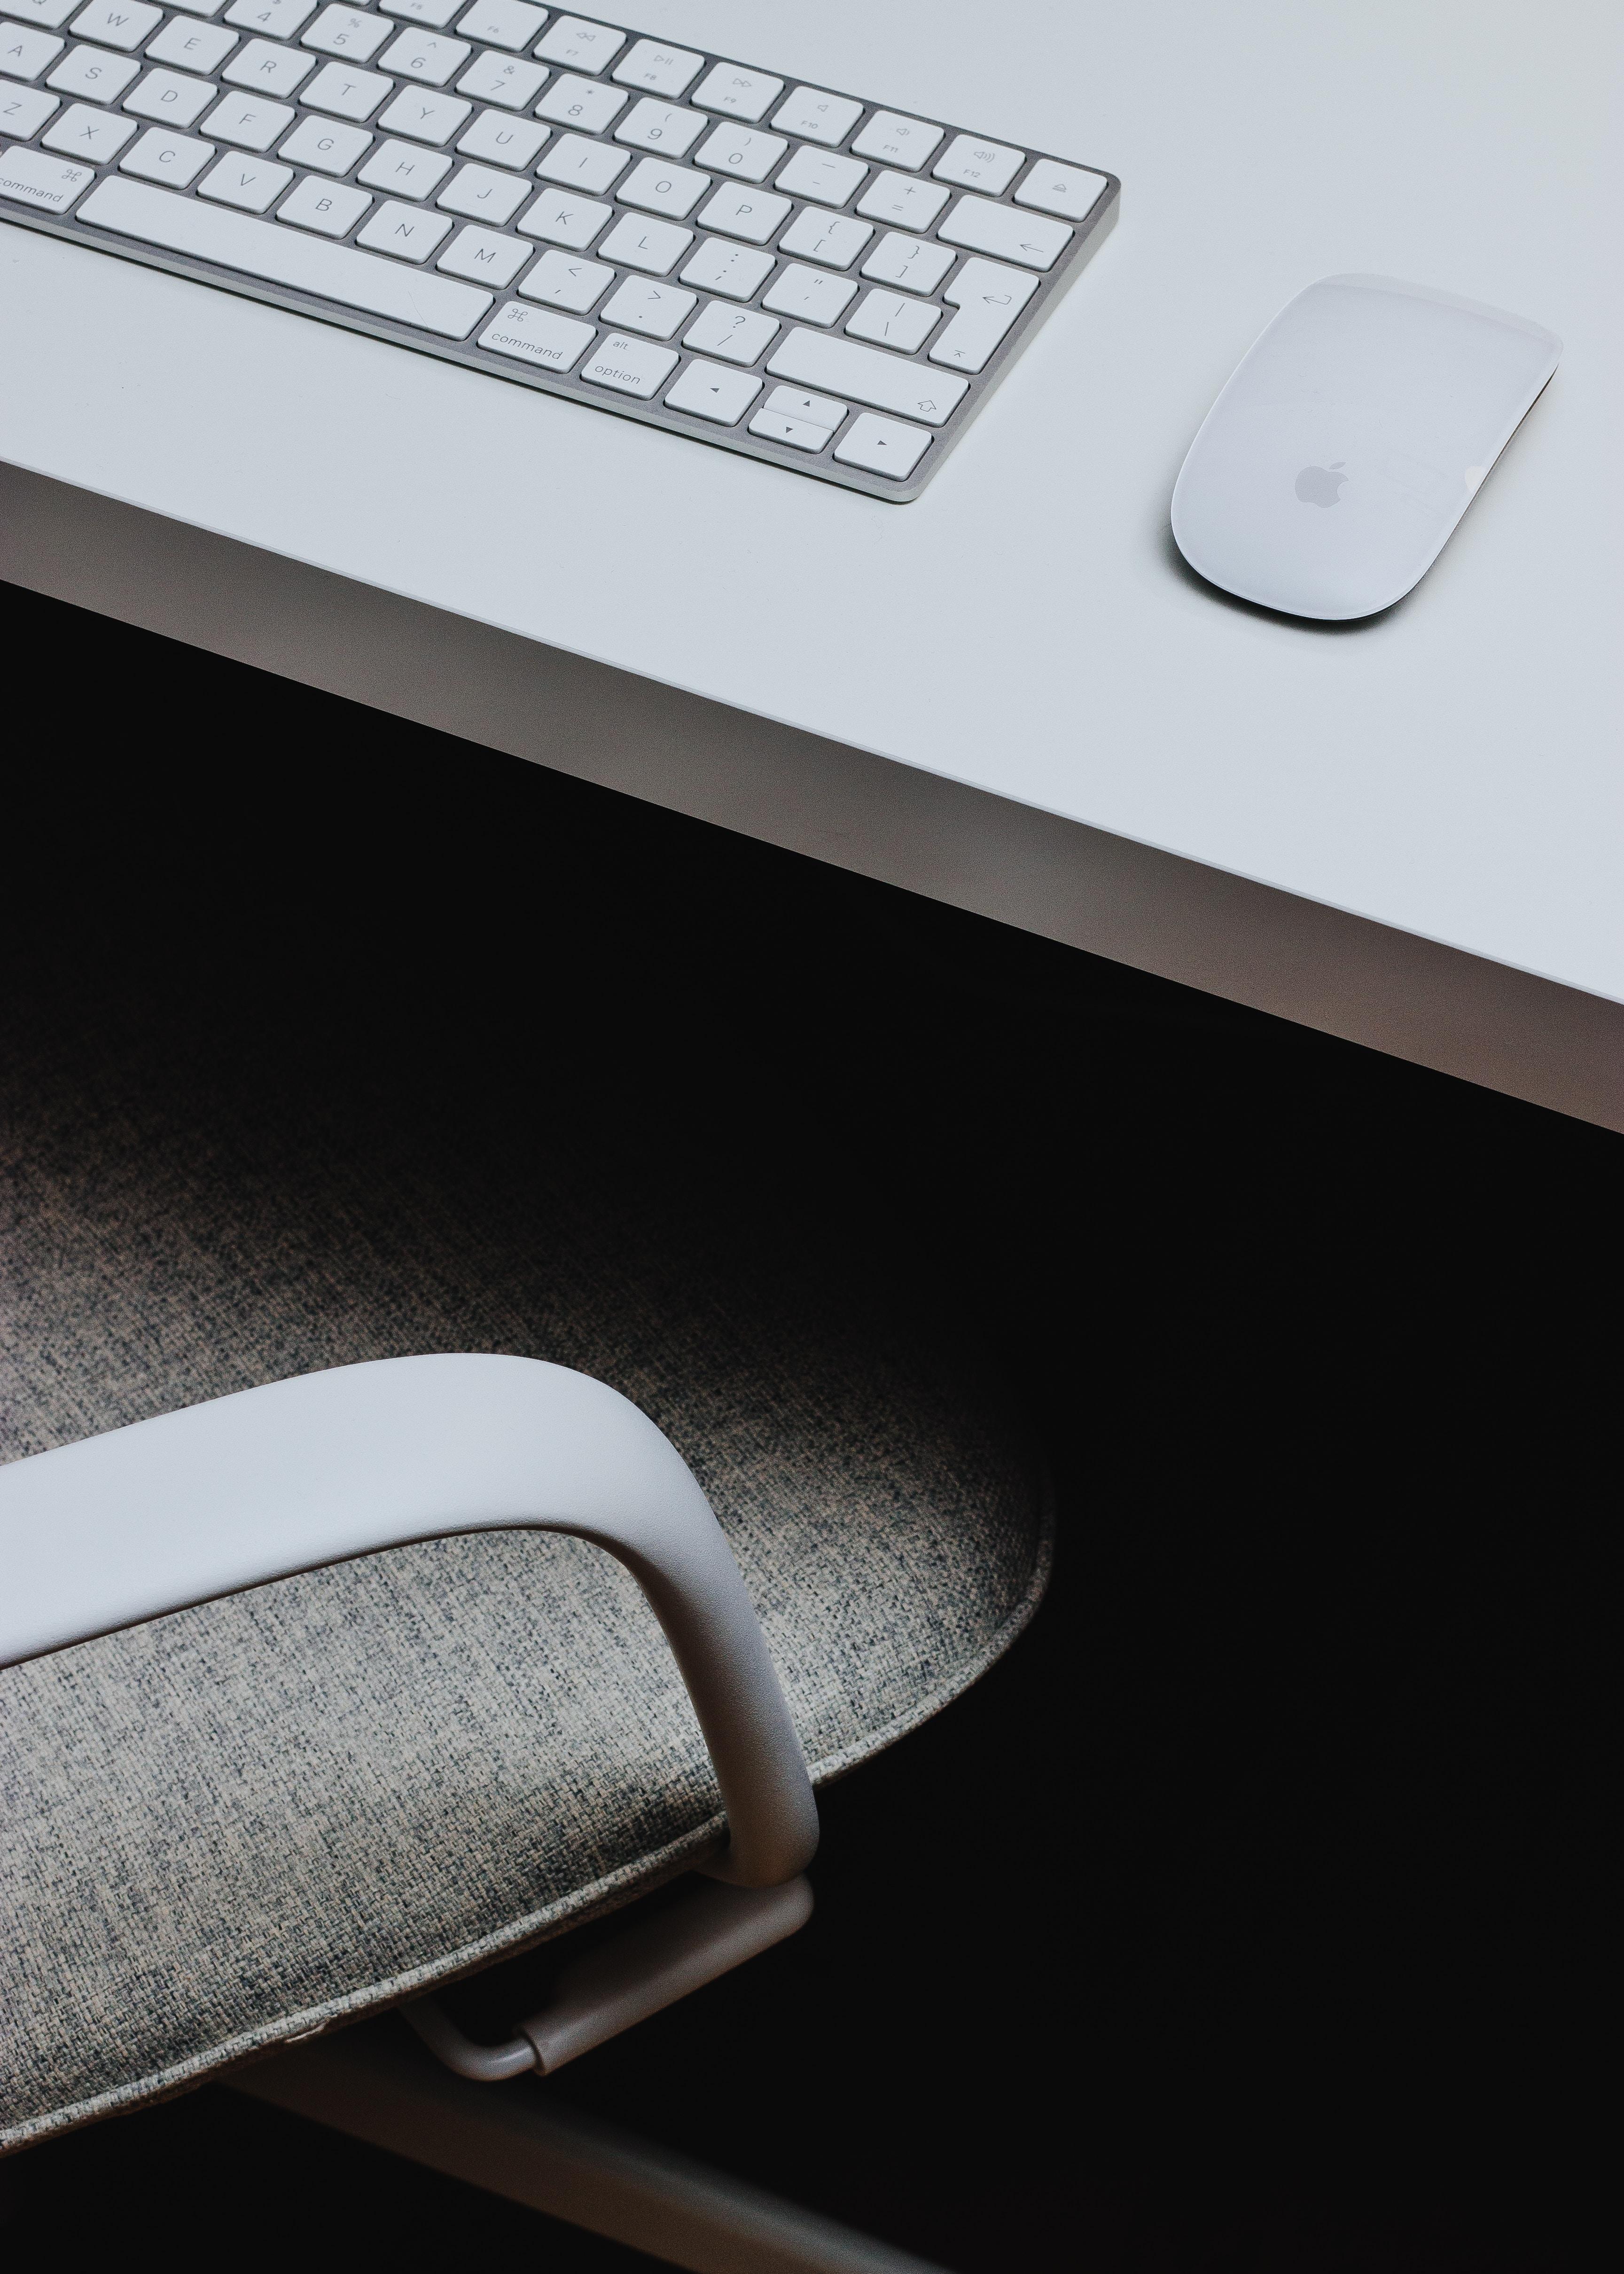 Sedentary Life - Job Stress